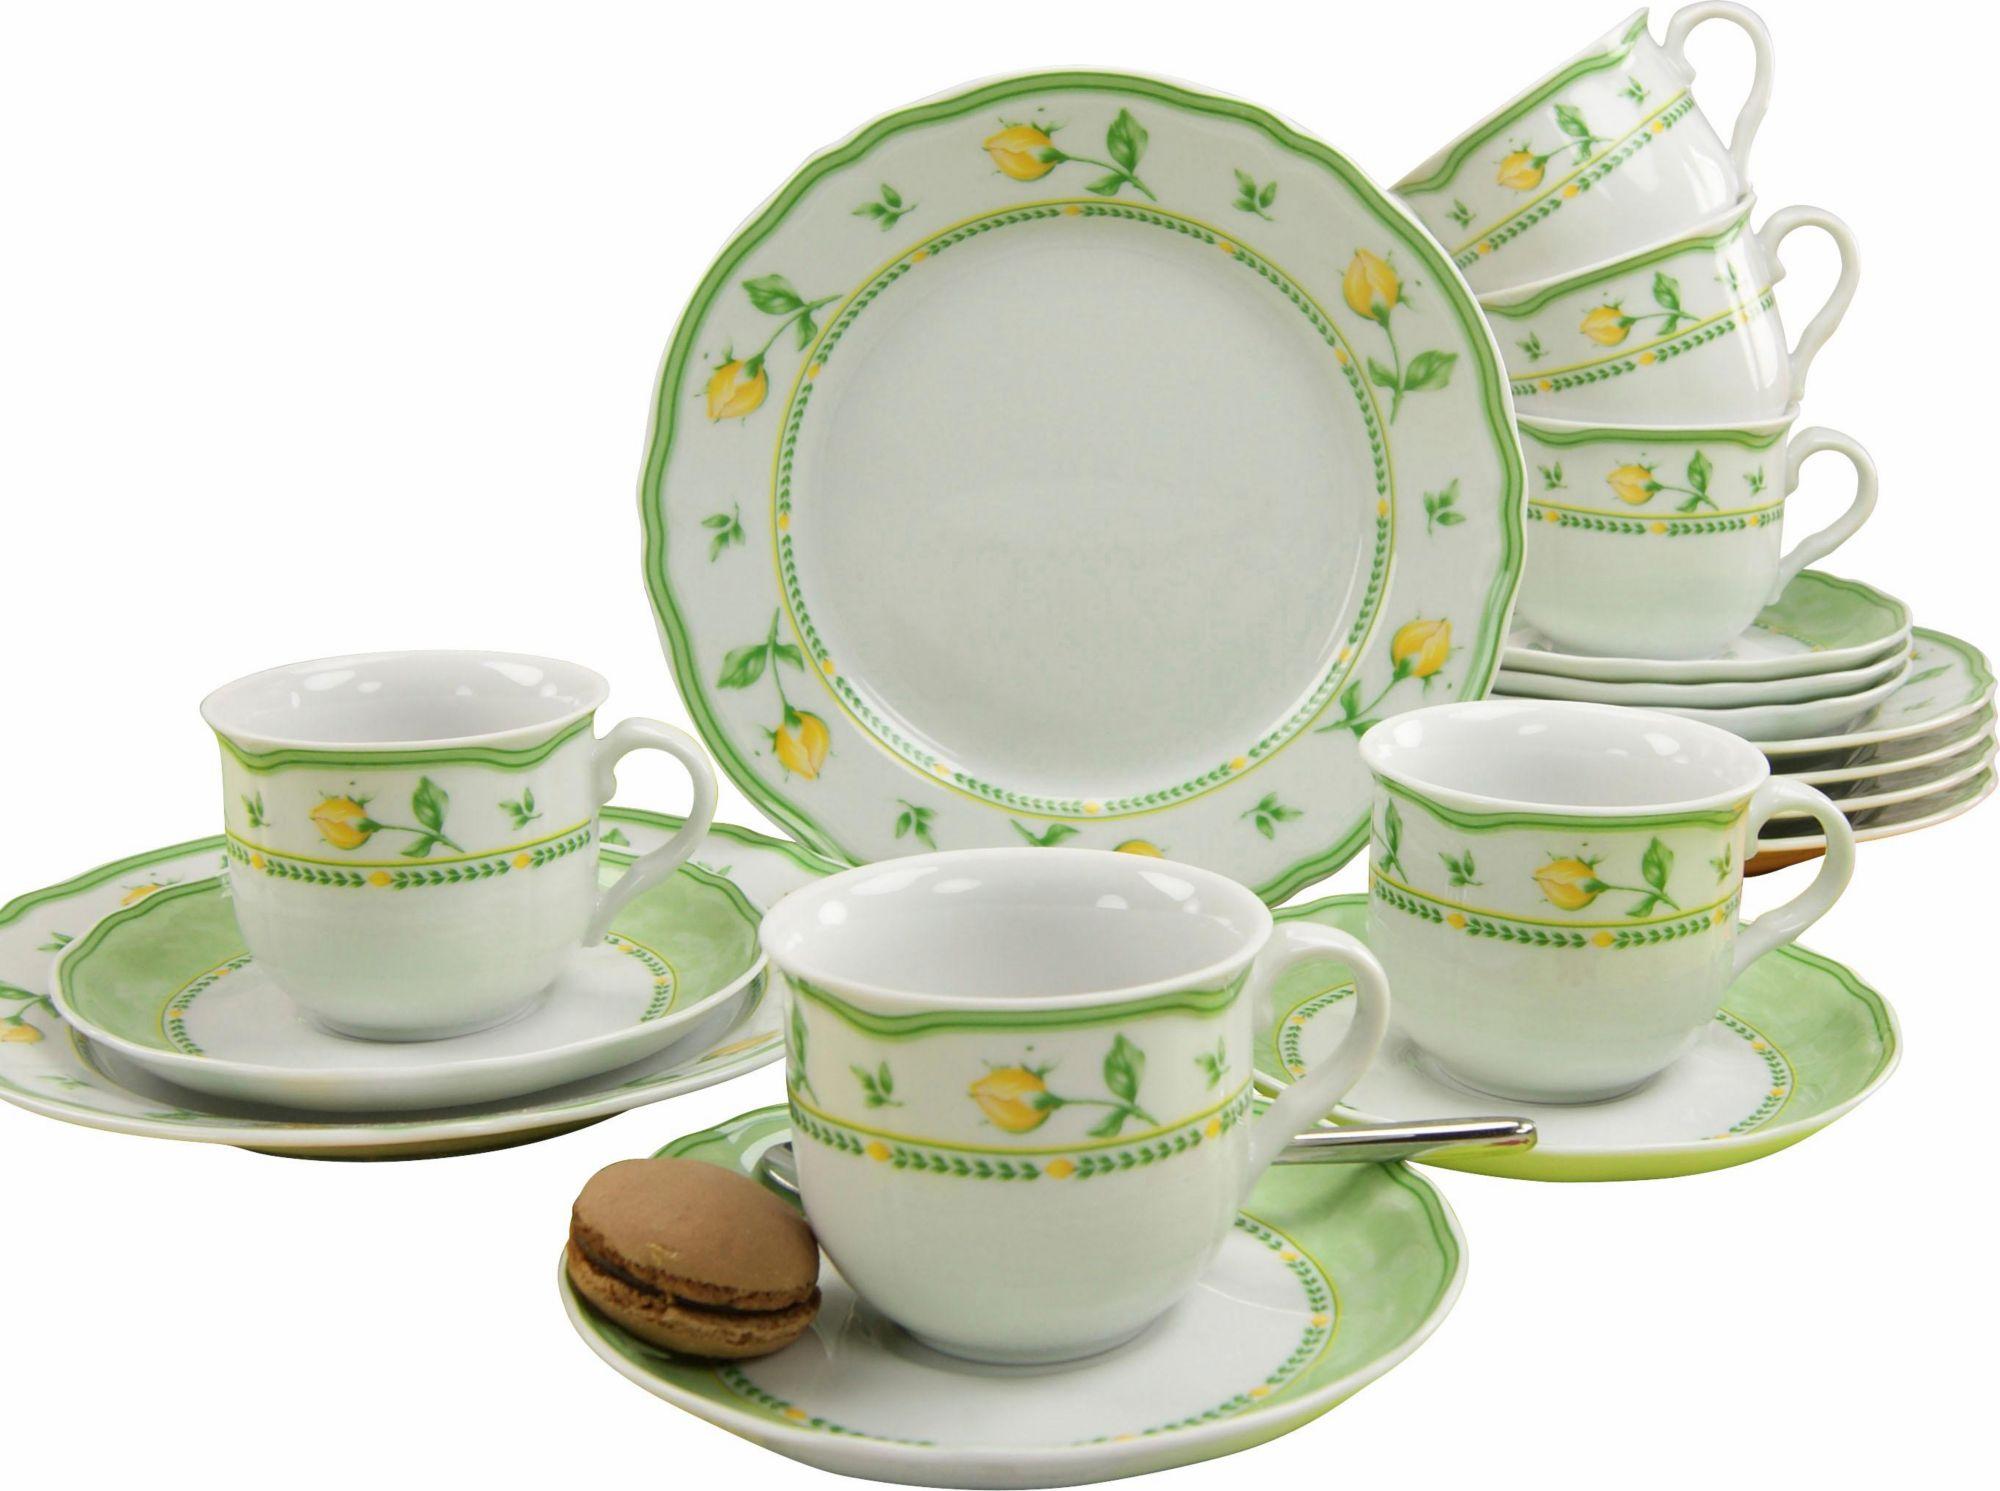 CREATABLE CreaTable Kaffeeservice Porzellan, 18 Teile, »Spring Rose«